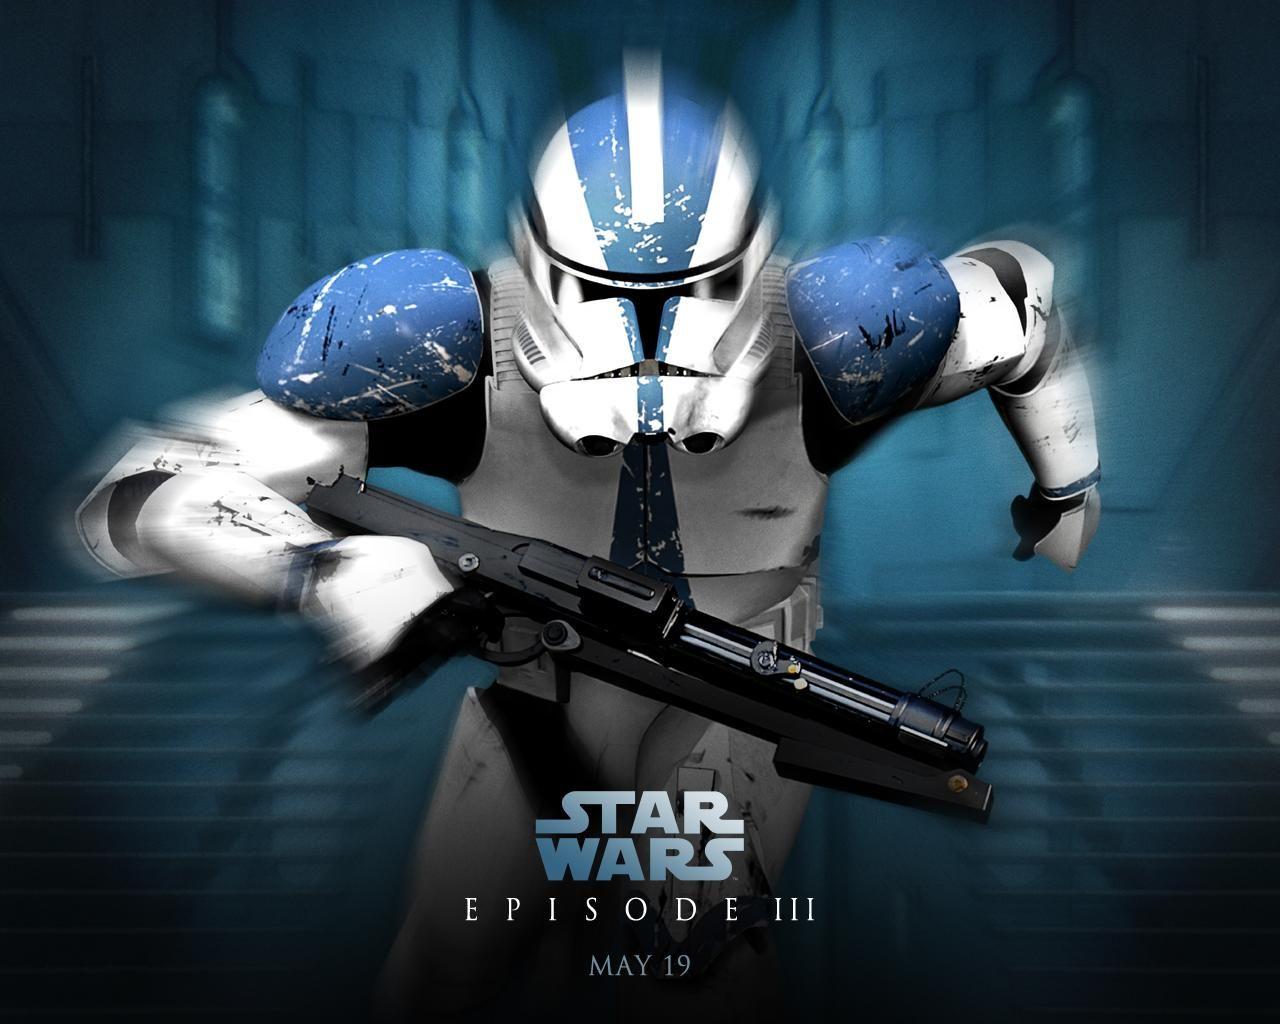 Star Wars Clone Troopers Wallpapers Star Wars Episodes Star Wars Clone Wars Star Wars Wallpaper